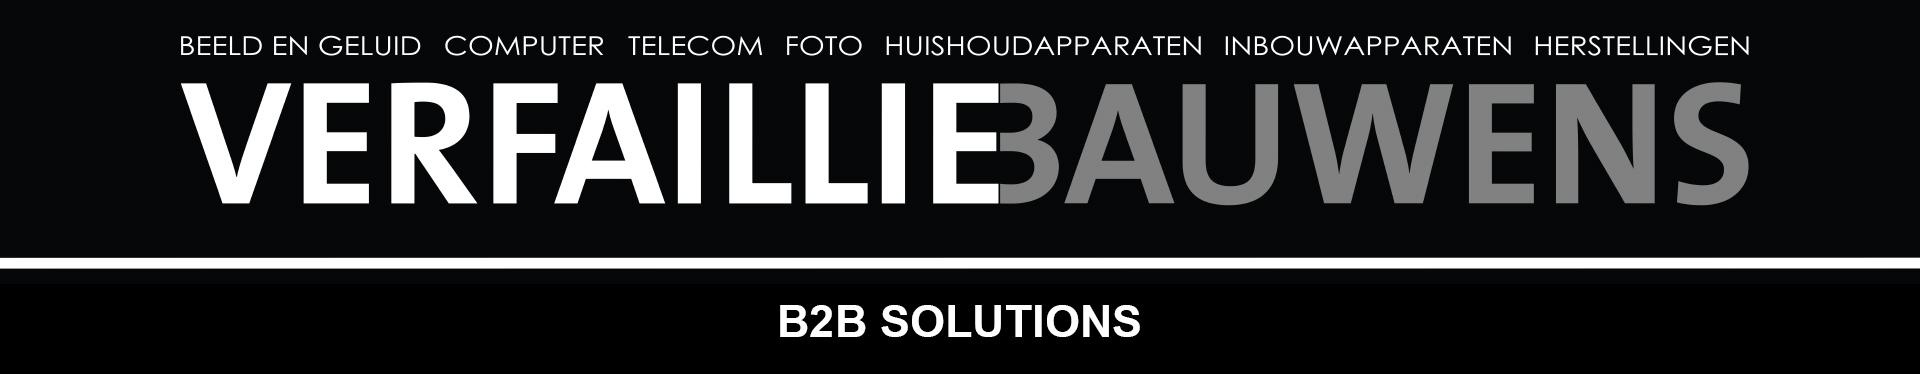 verfaillie bauwens b2b solutions